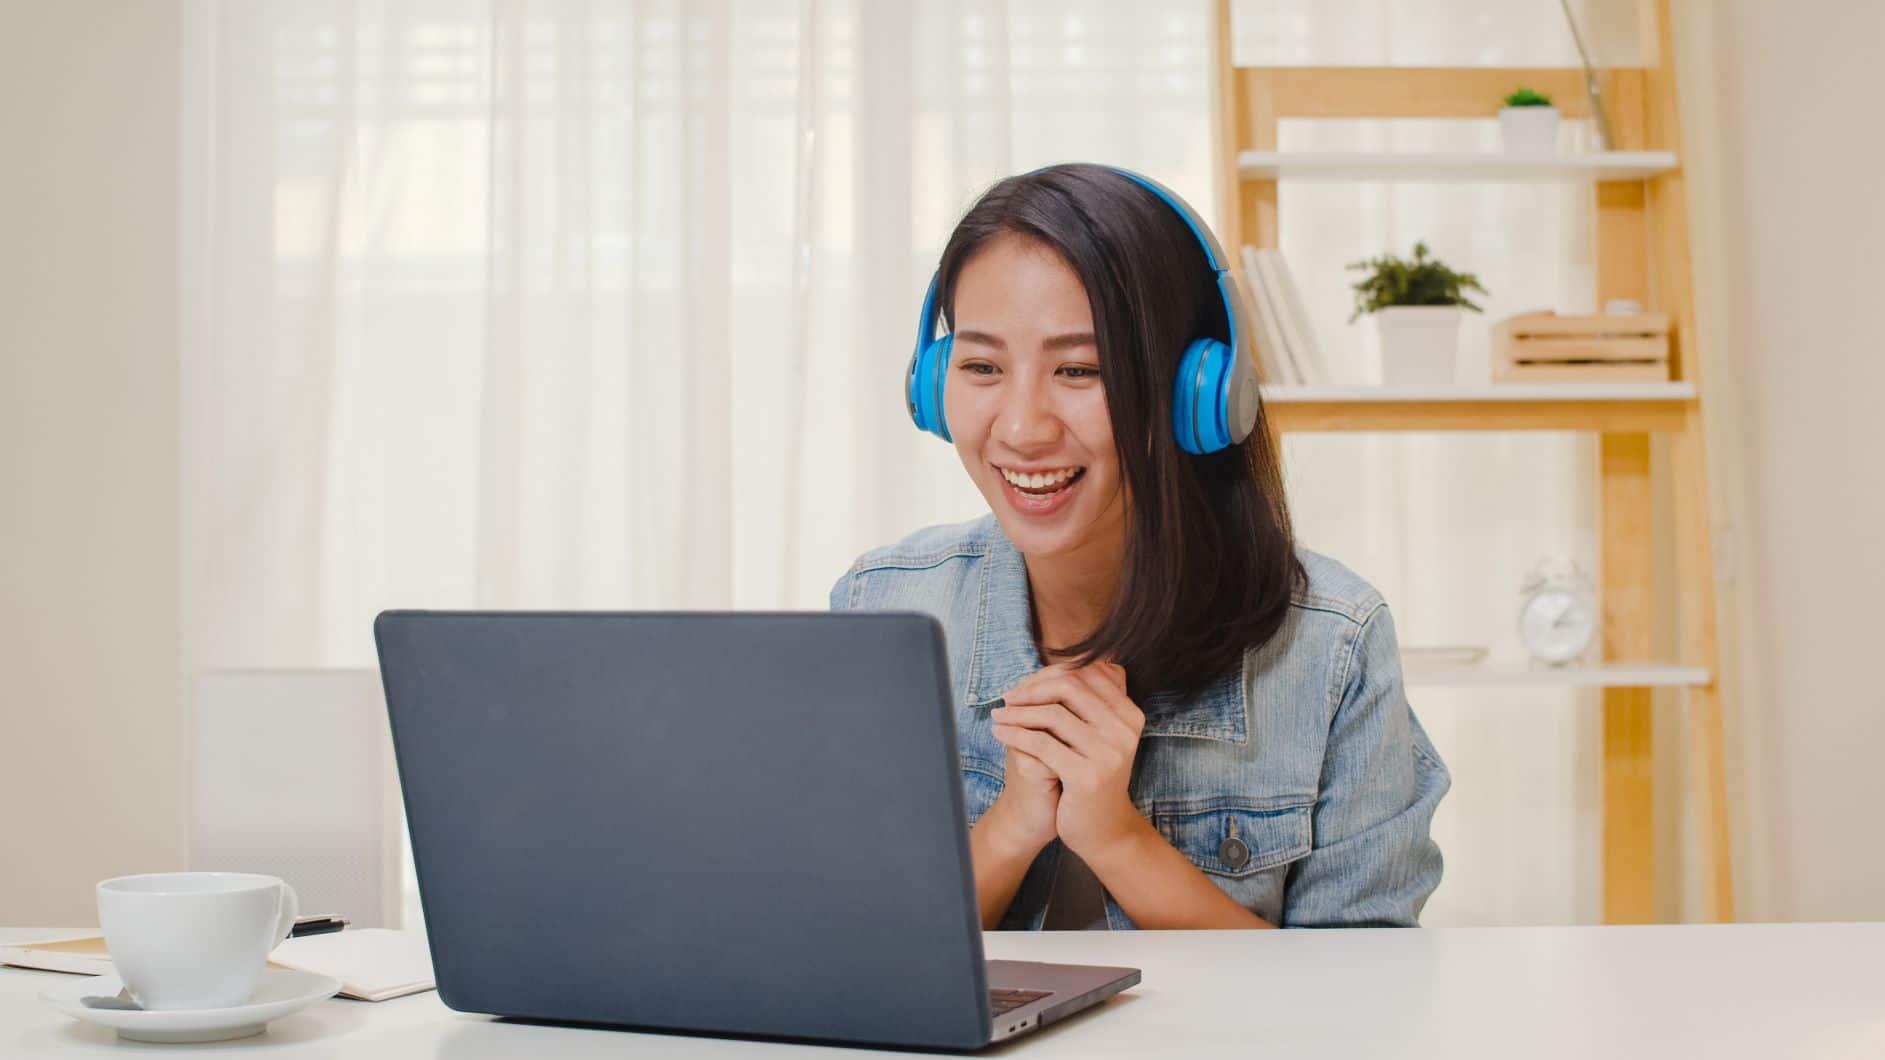 как проходит онлайн консультация психолога